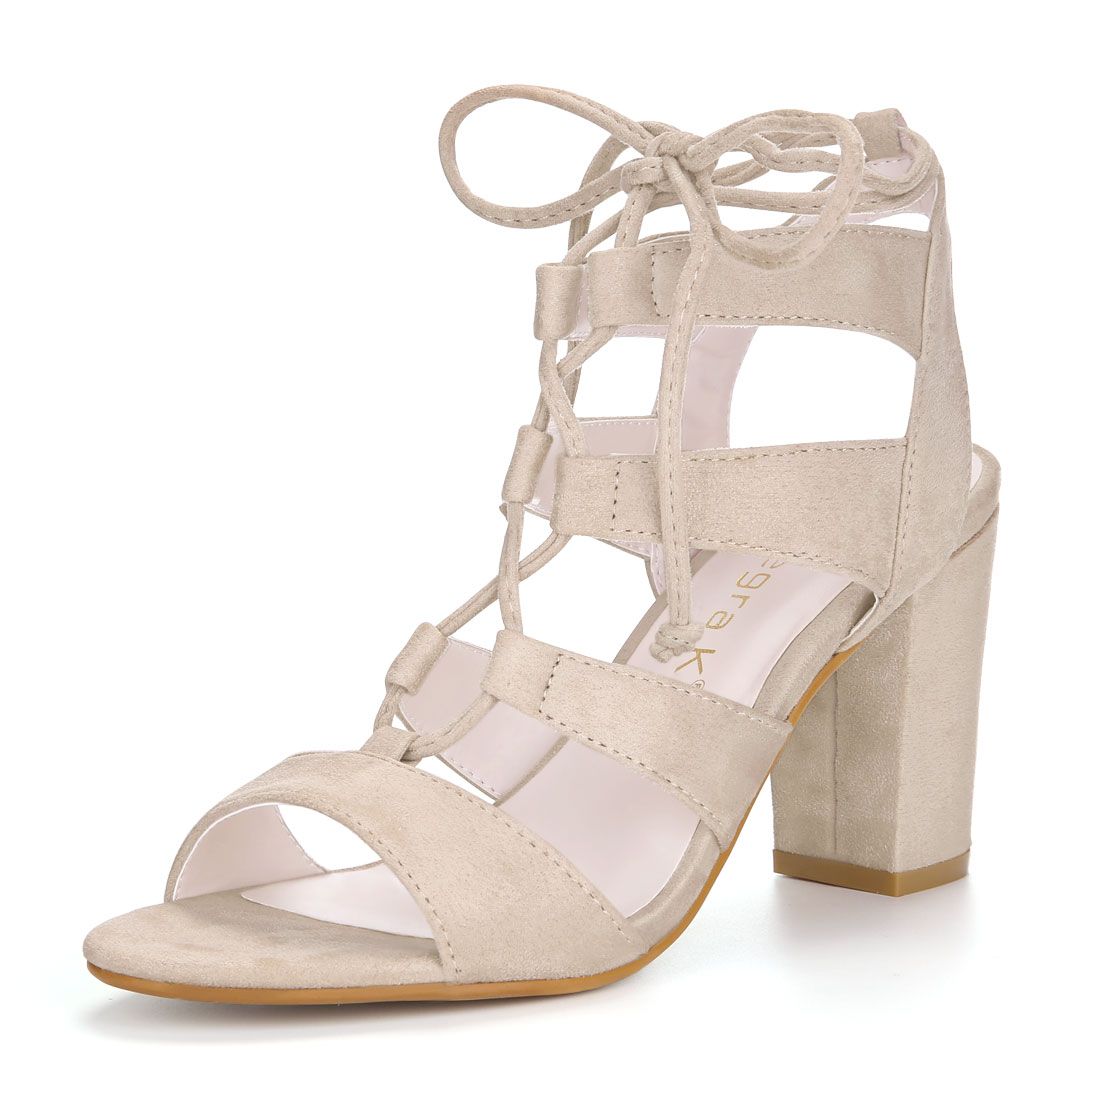 Allegra K Women's Tie Up Strappy Gladiator Block Heel Sandals Red US 9.5